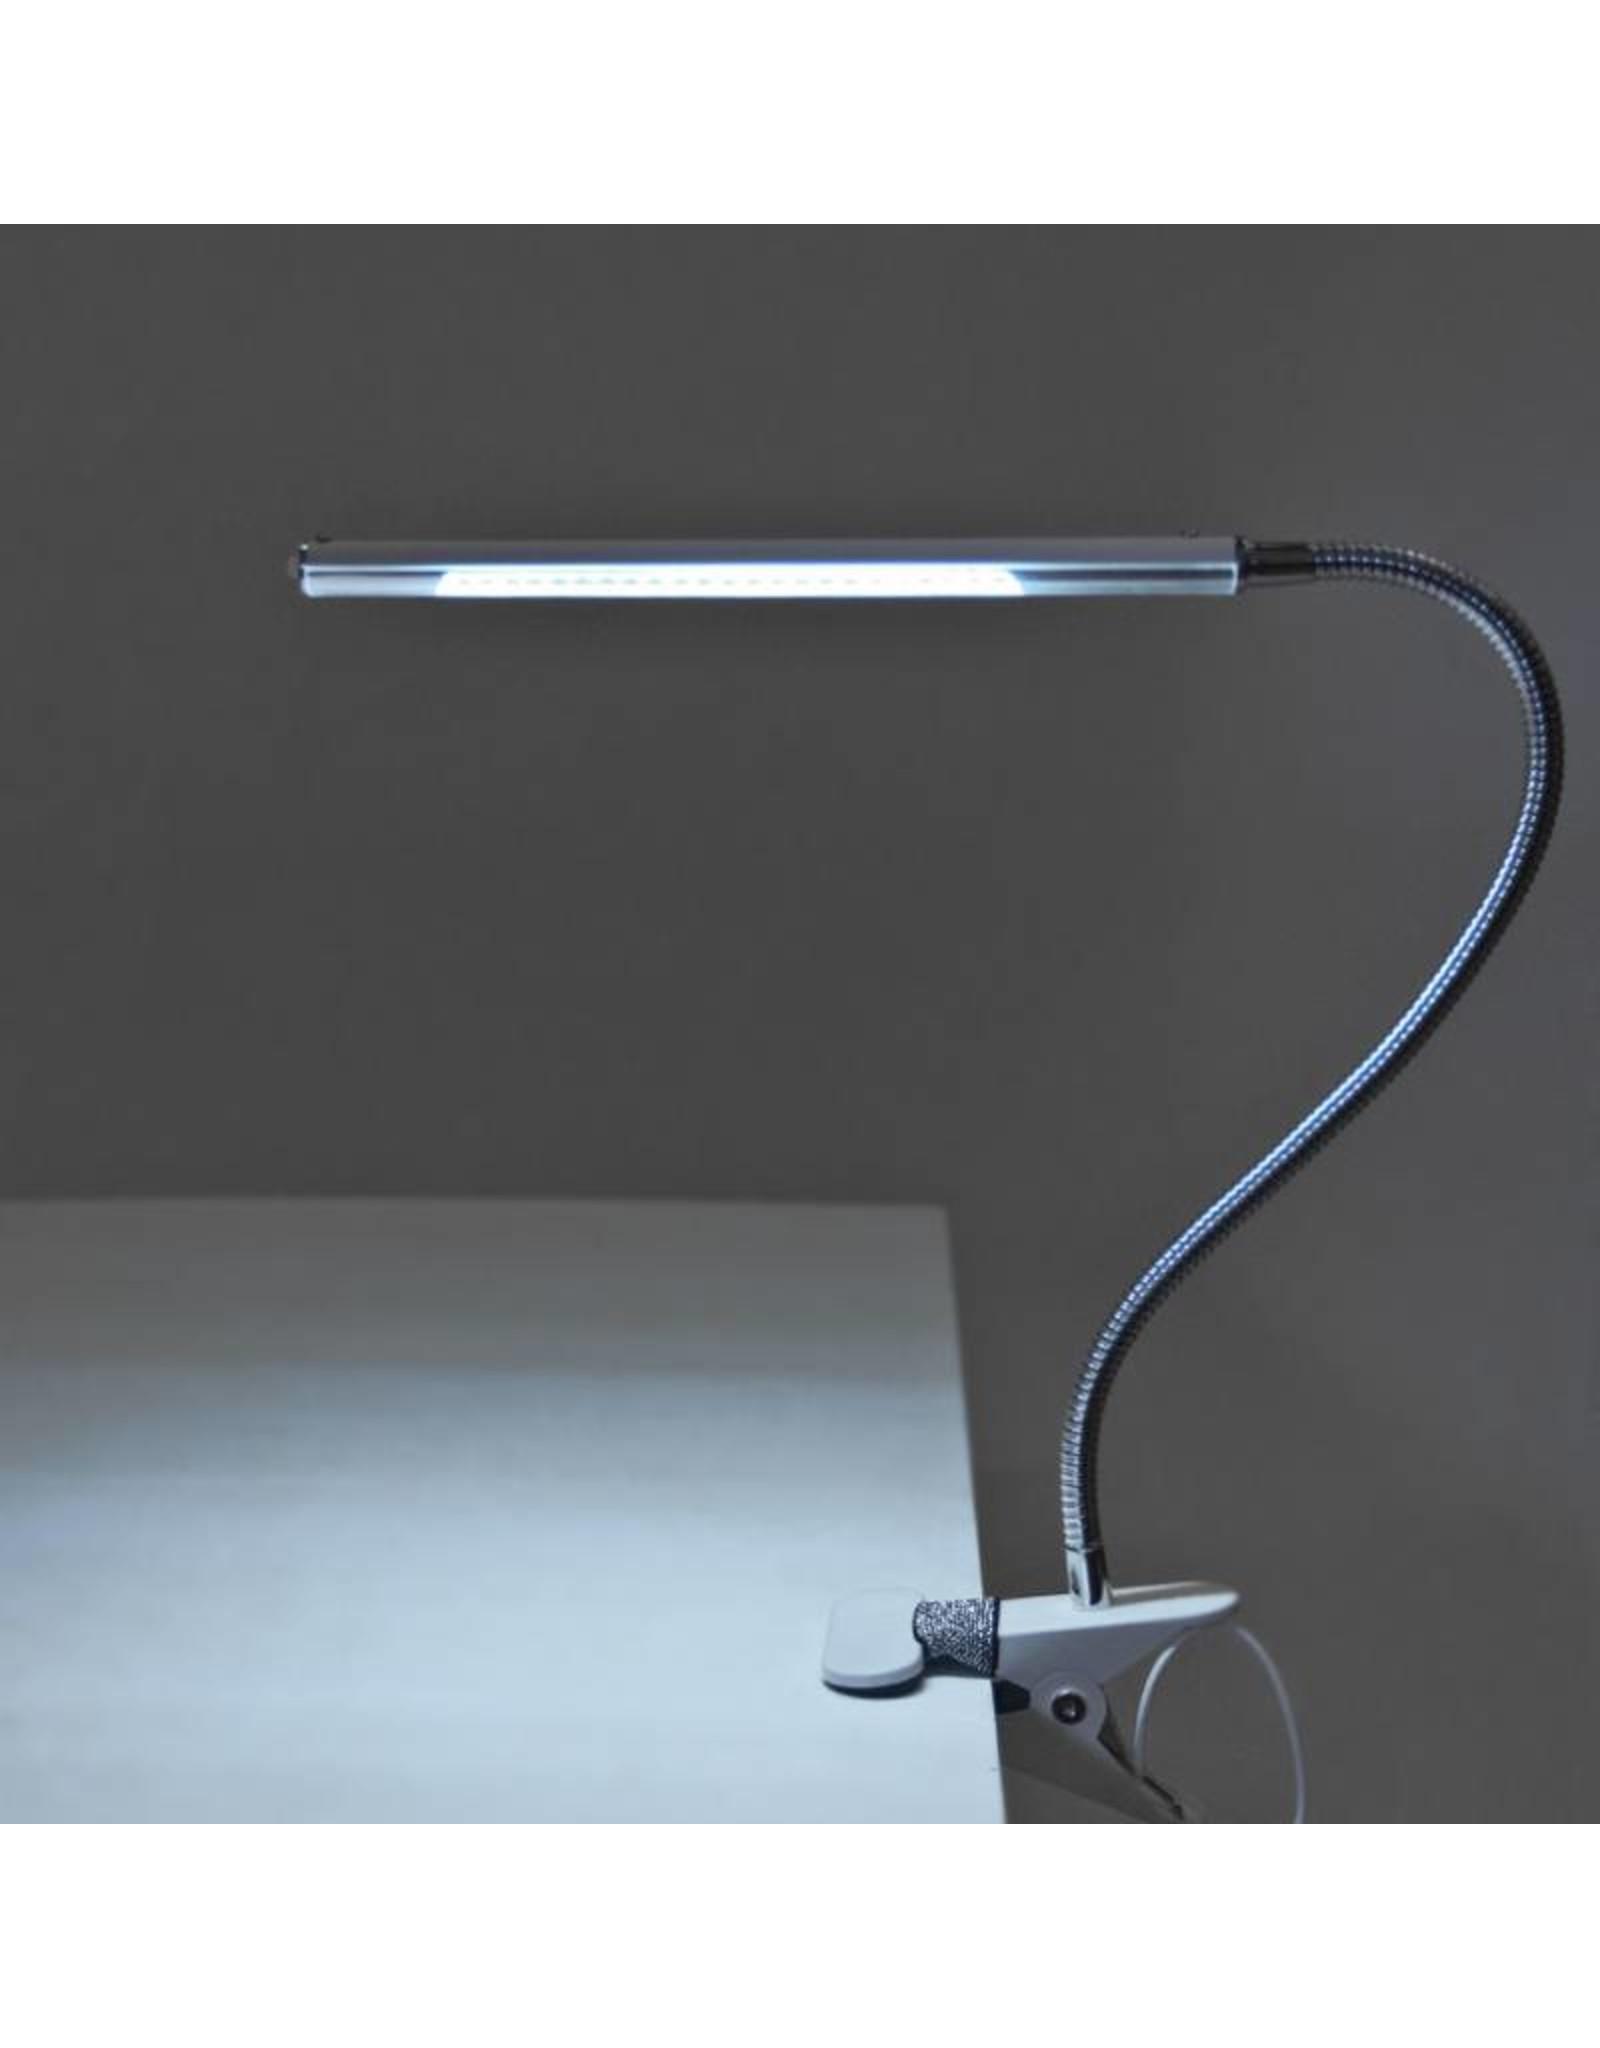 Mega Beauty Shop® LED Tafellamp Wit met een flexibele arm op tafelklem.